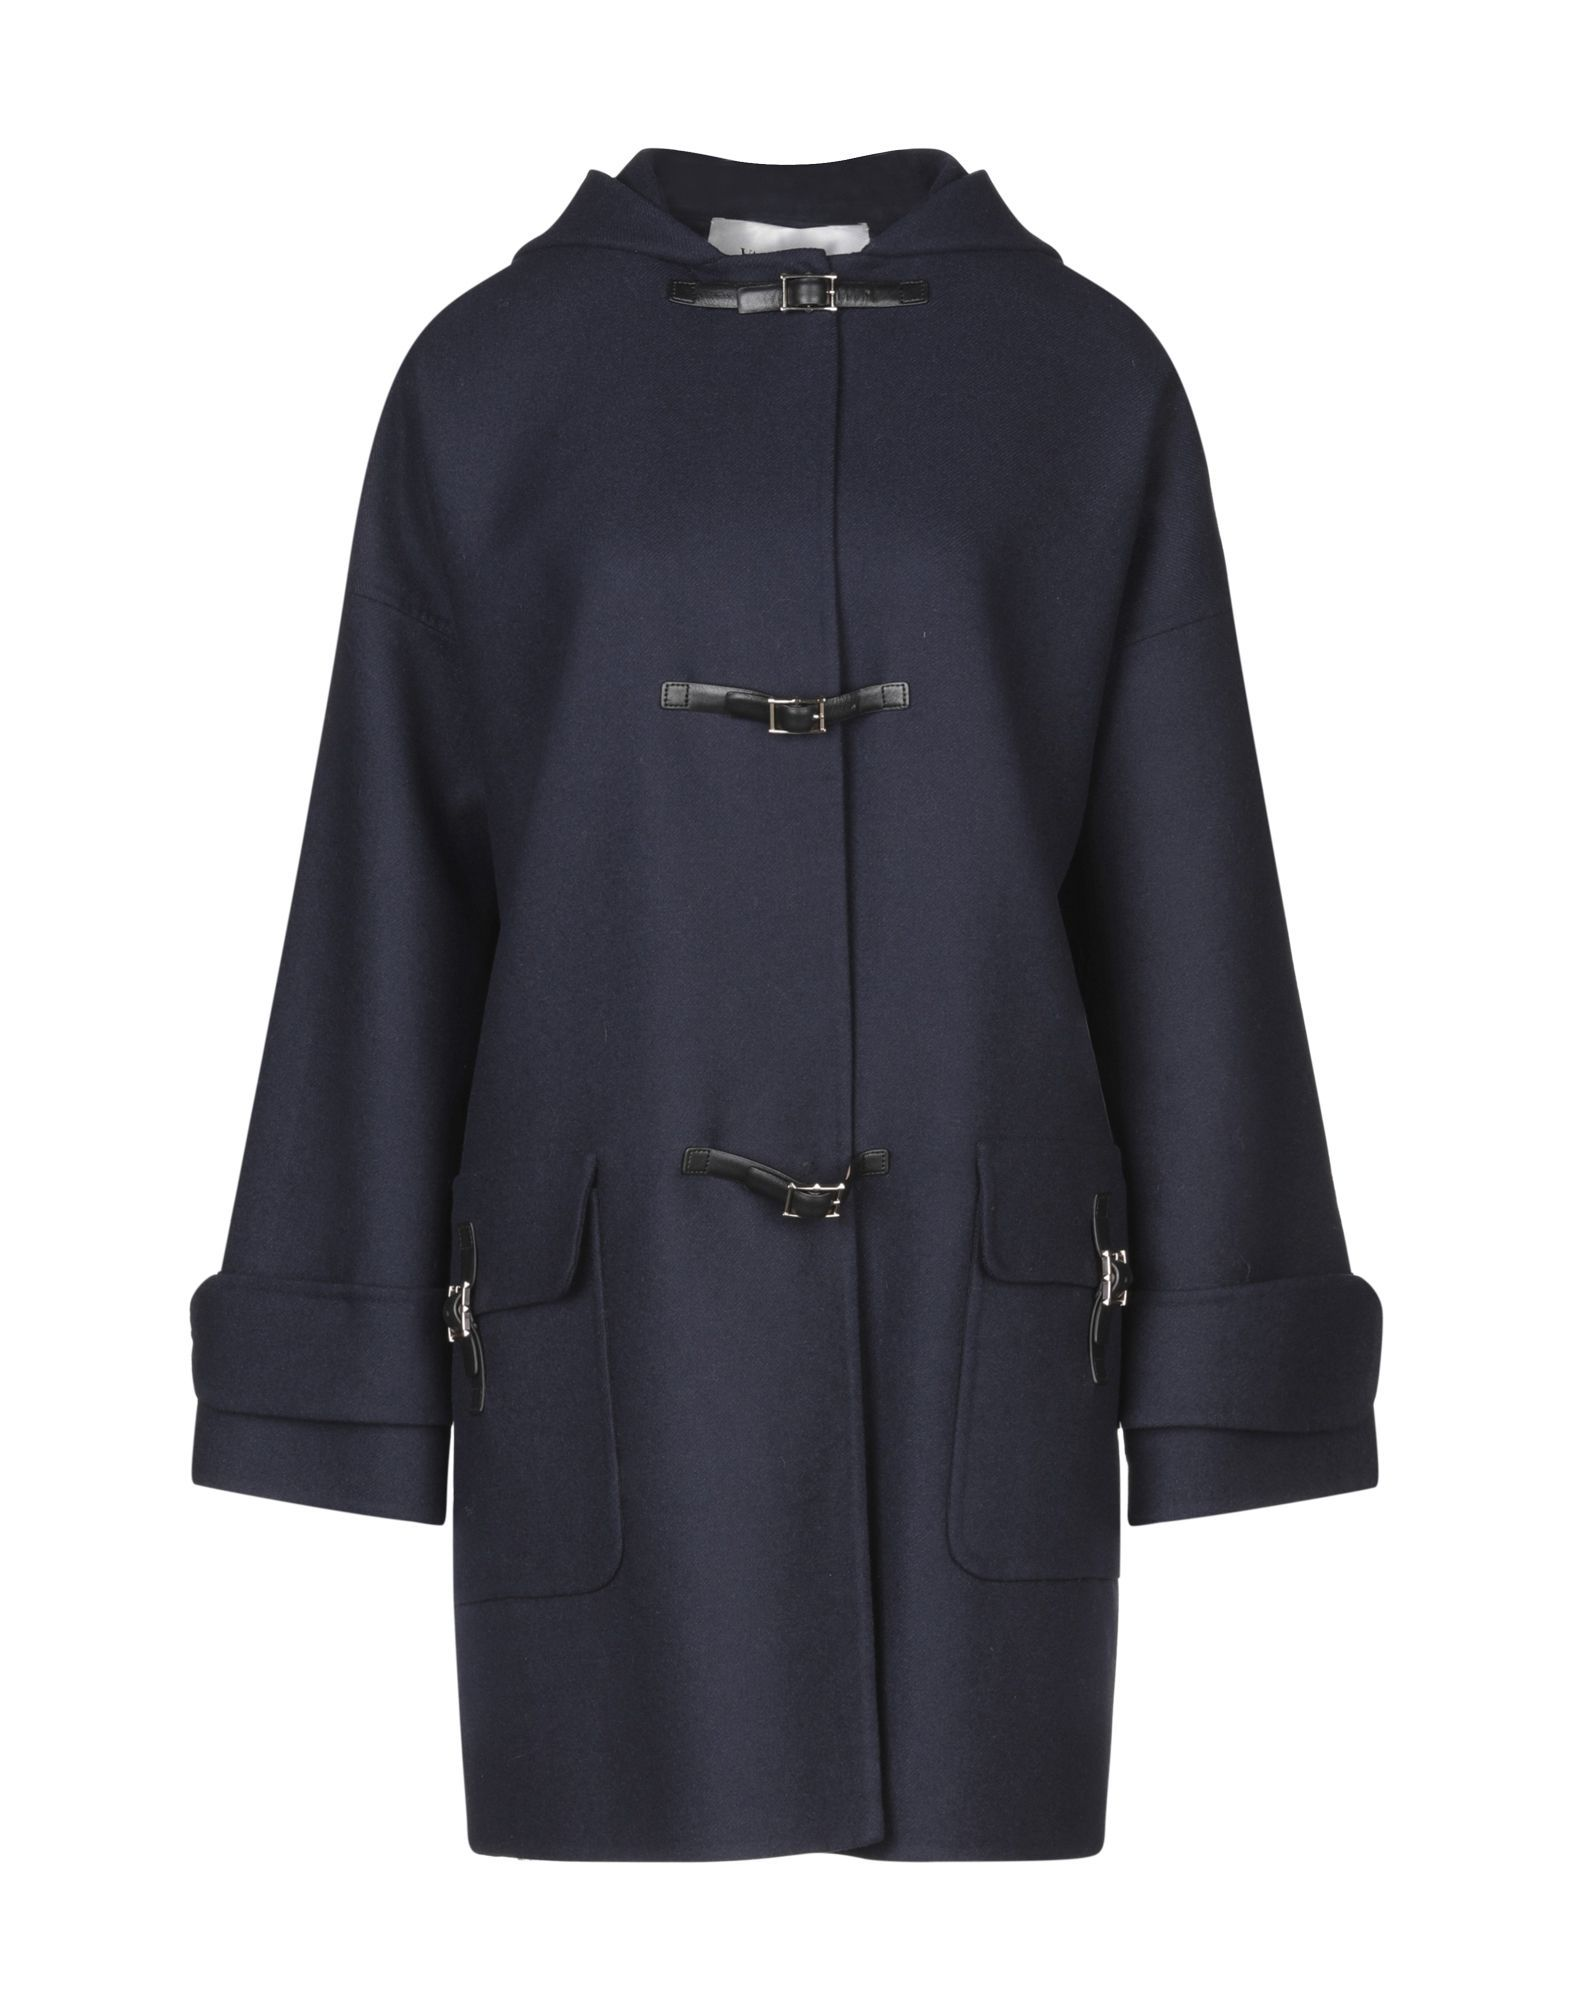 Valentino Dark Blue Virgin Wool Overcoat